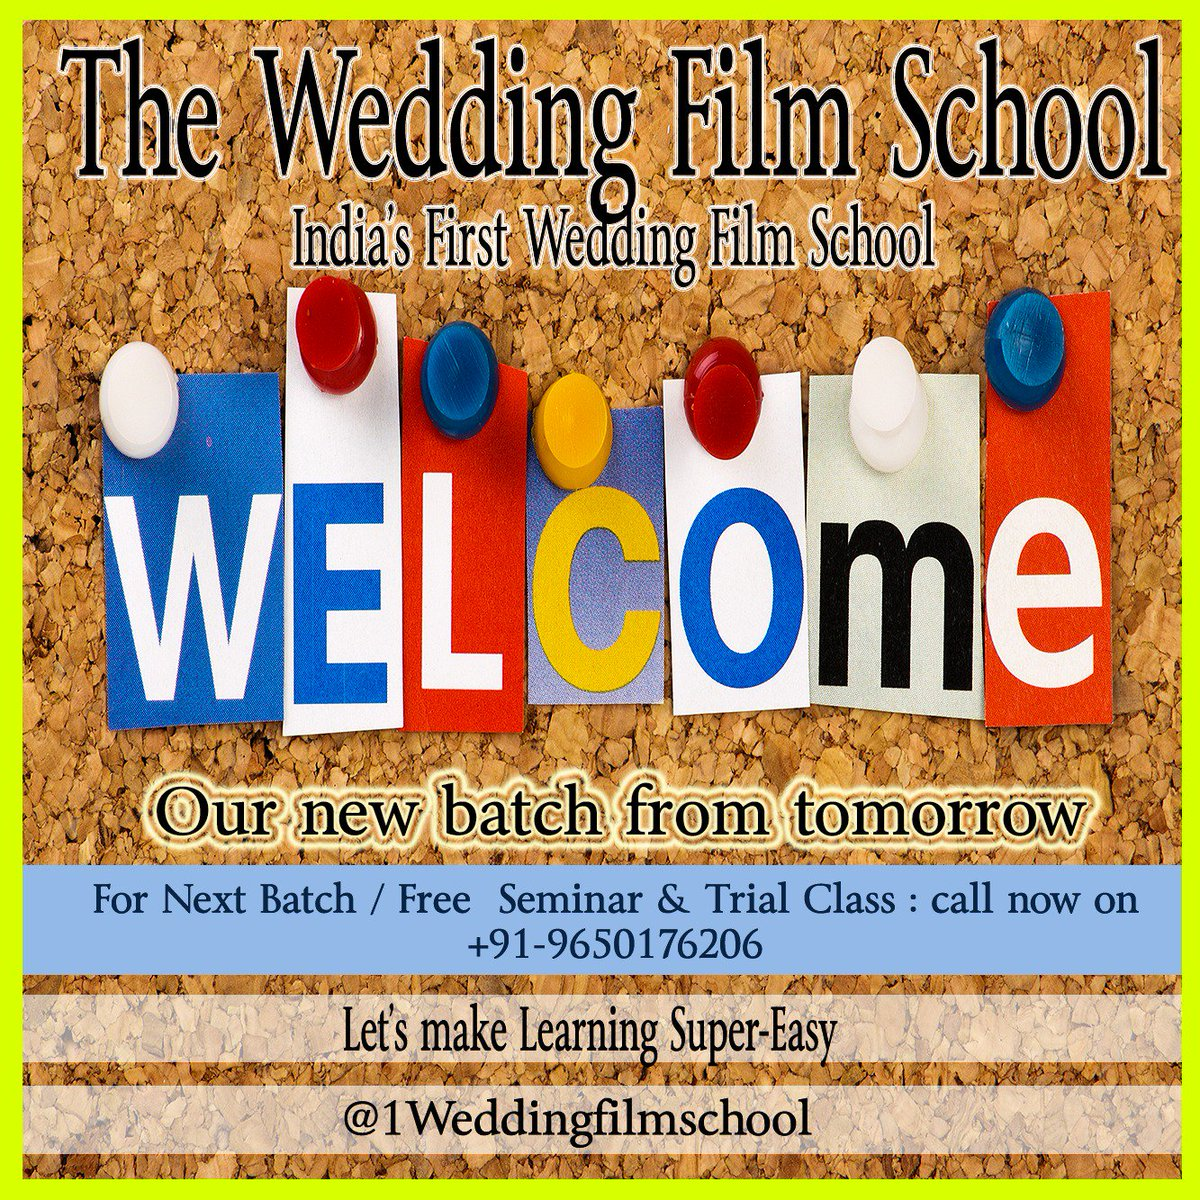 Wedding Film School.The Wedding Film Sch 1wedfilmschool Twitter